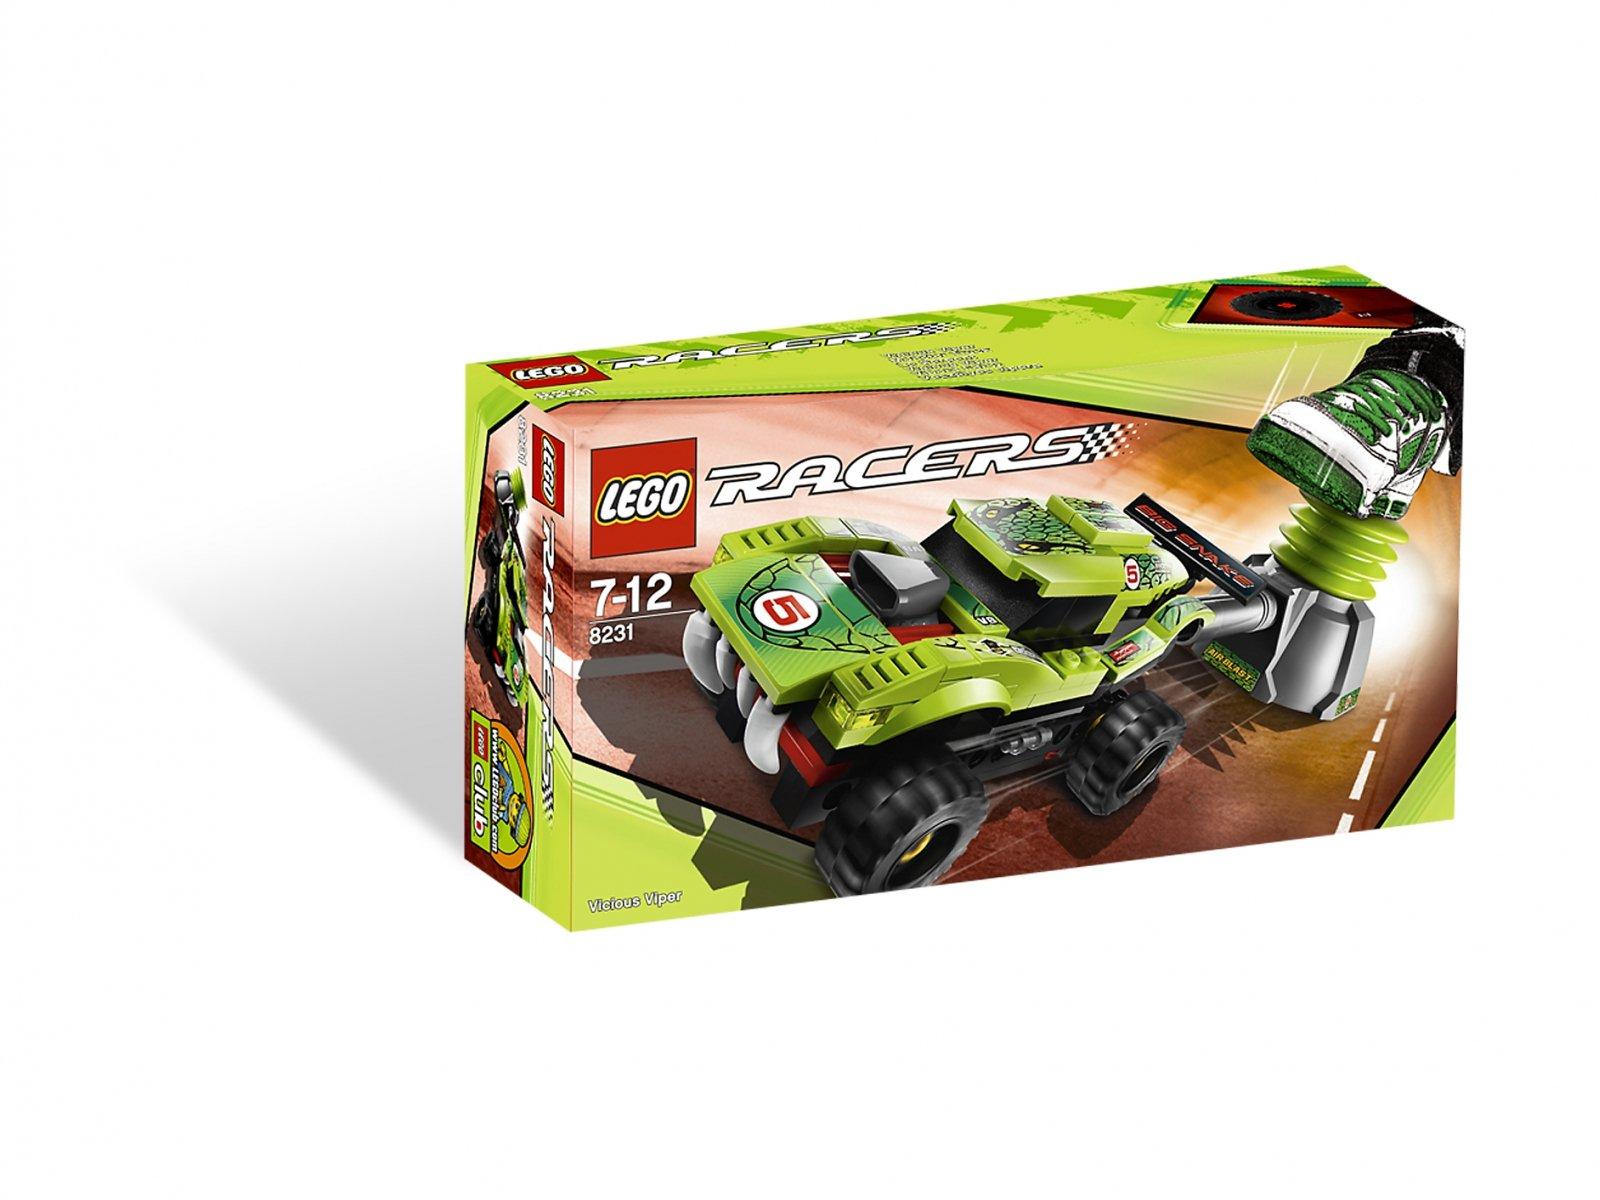 LEGO Racers 8231 Groźna Żmija